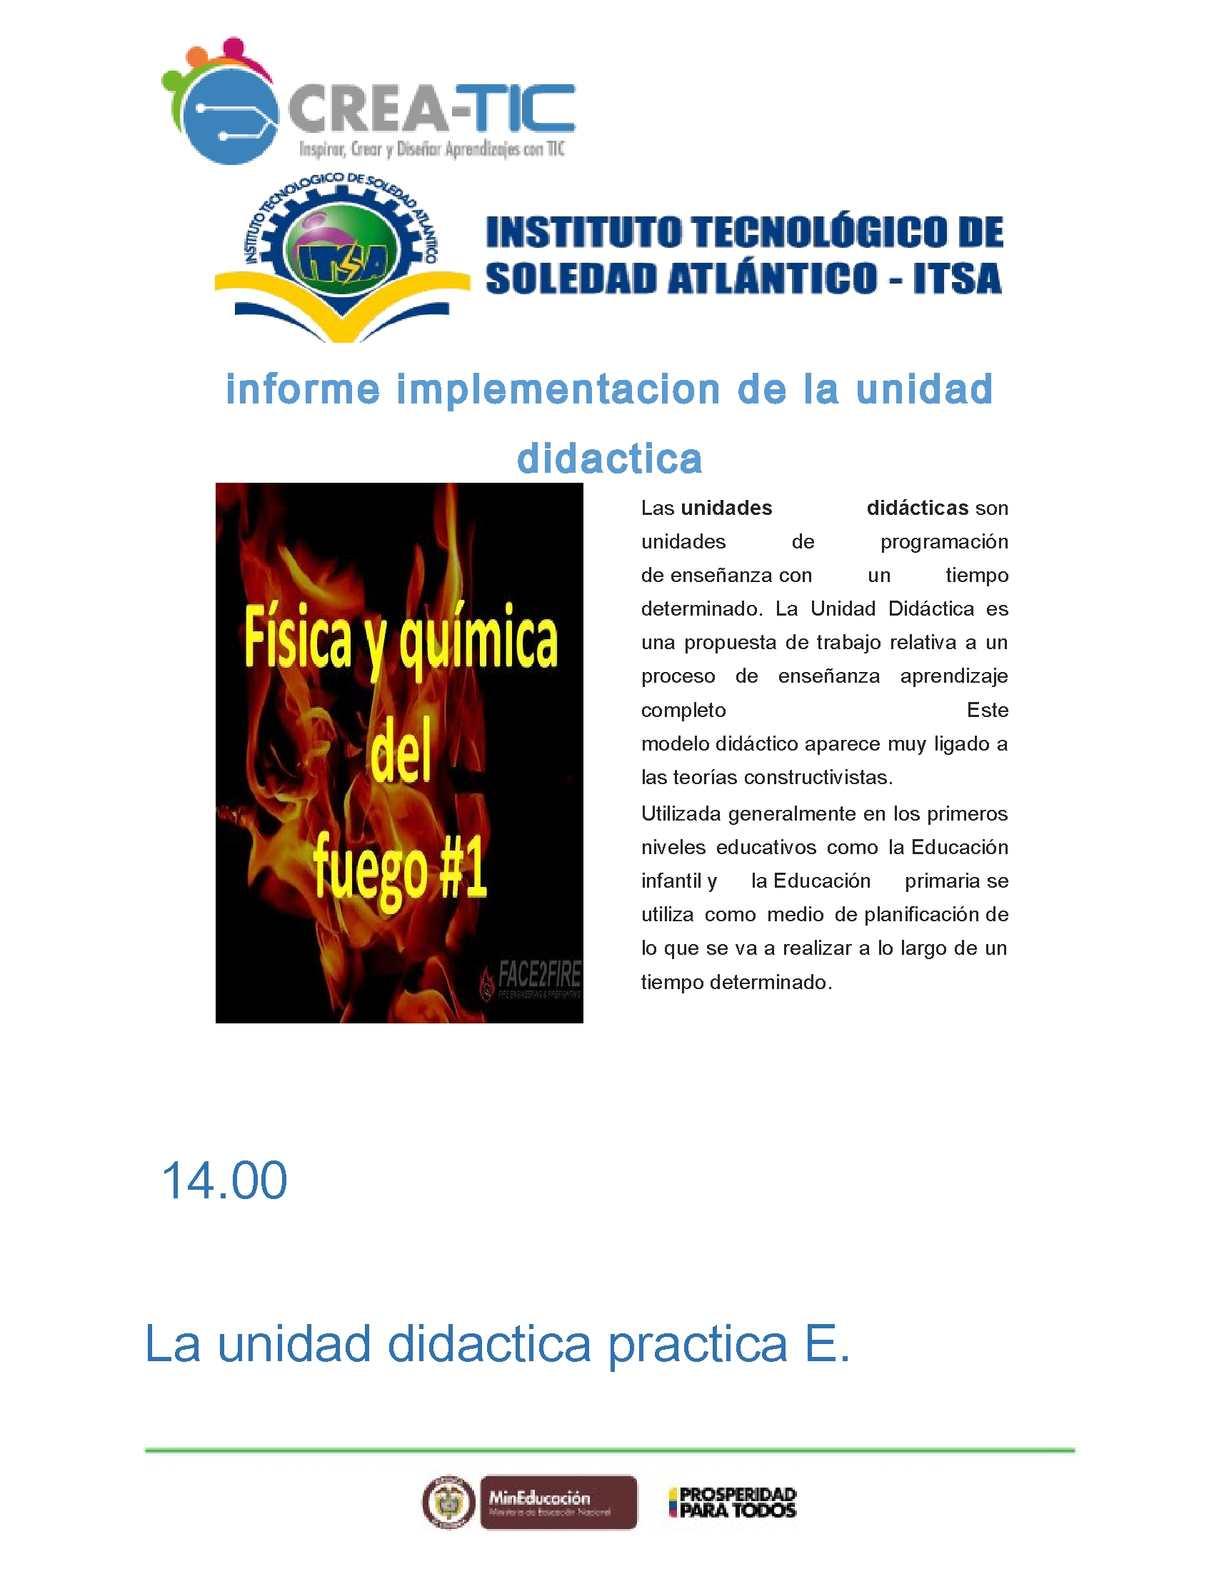 Calaméo - Plantilla Unidad Didactica Creatic, Tema E